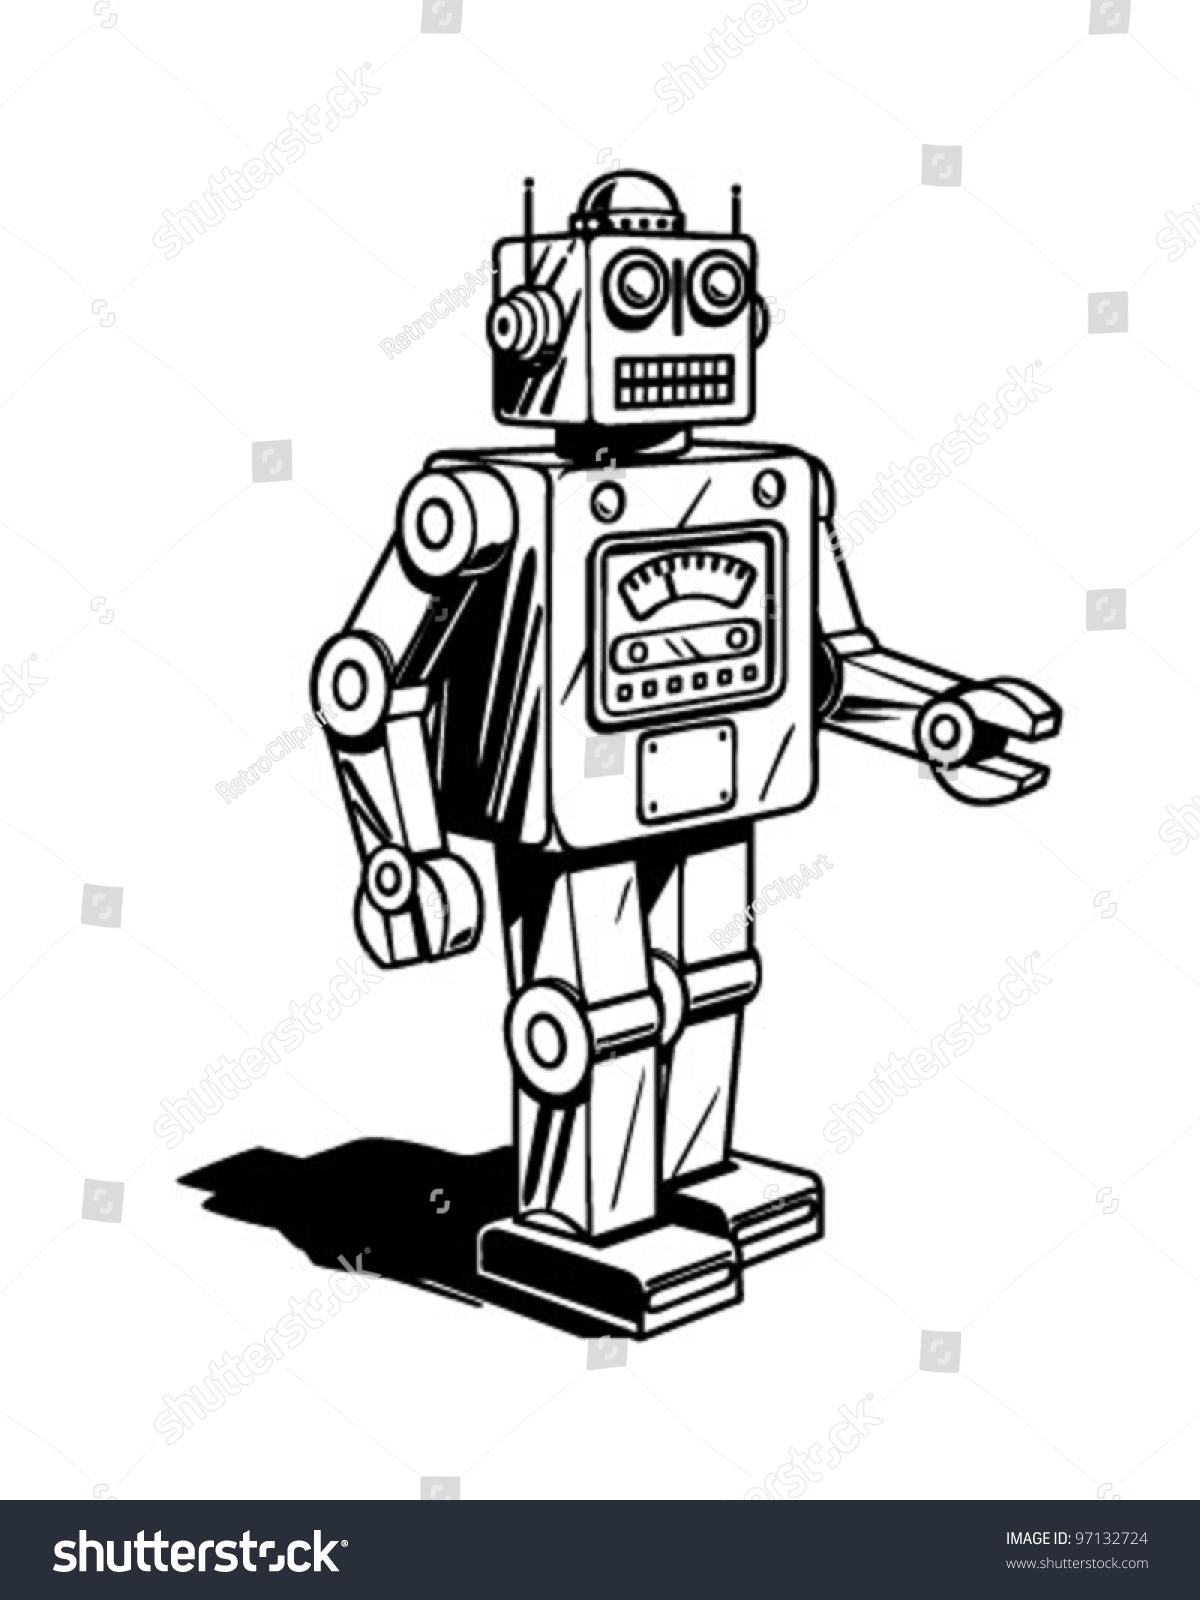 Retro Robot Clipart Illustration Stock Vector 97132724 - Shutterstock